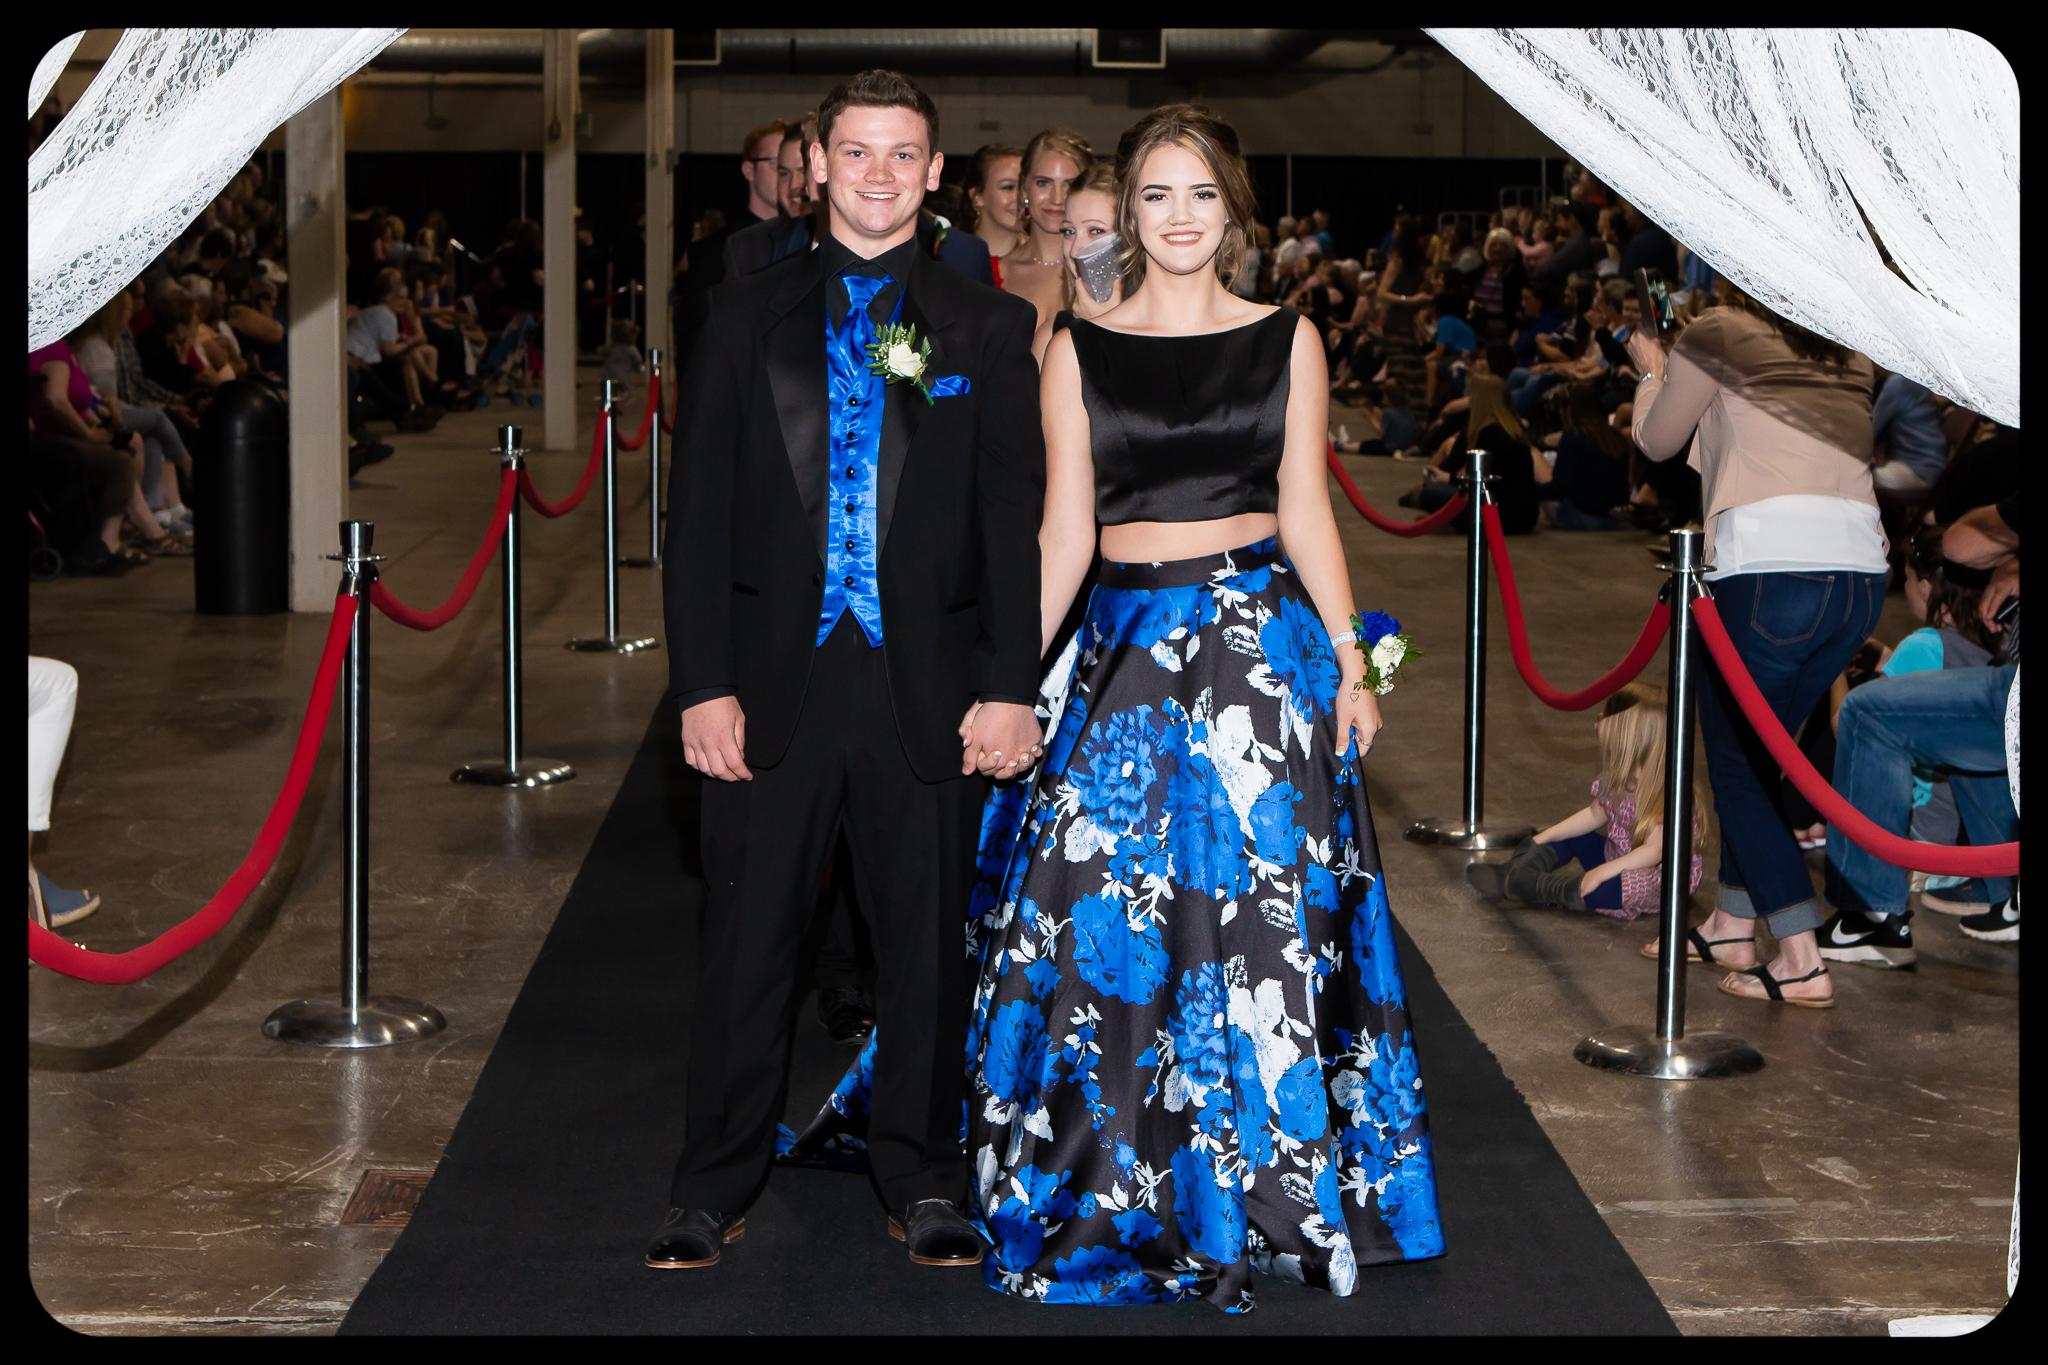 Bluefield Prom 2018 23